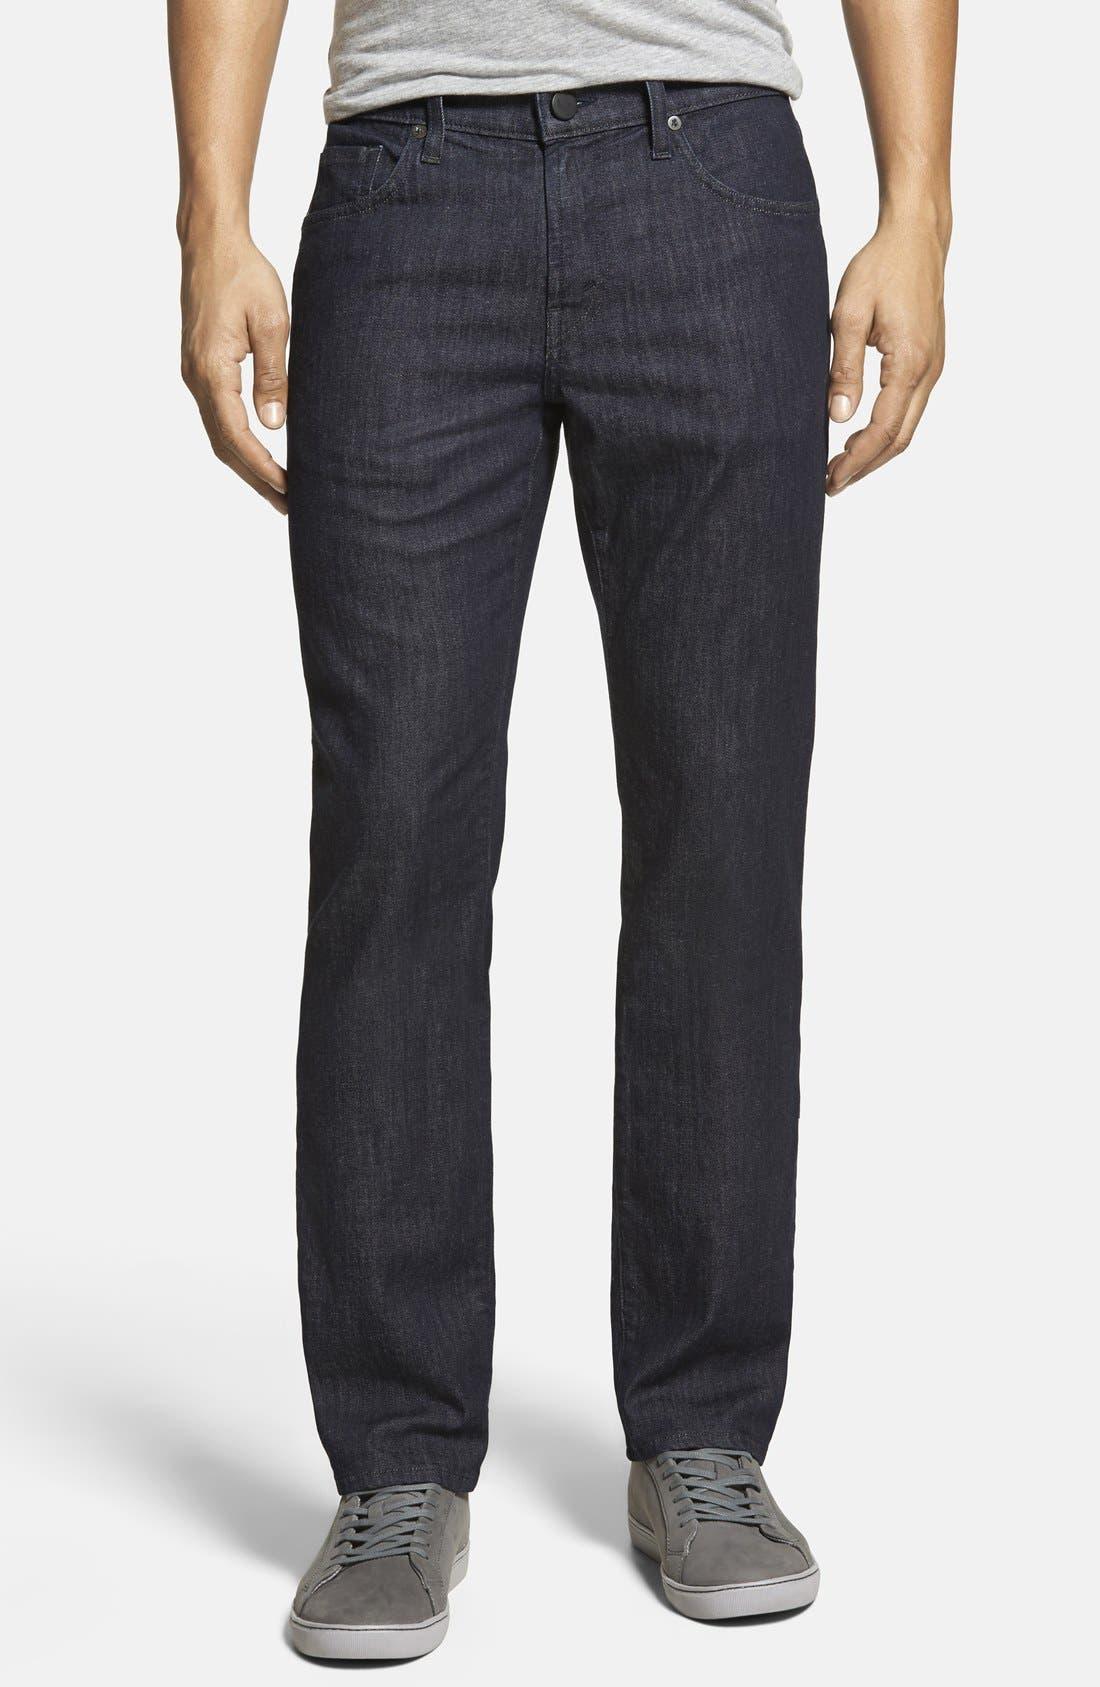 Kane Slim Straight Leg Jeans,                         Main,                         color, HIRSCH